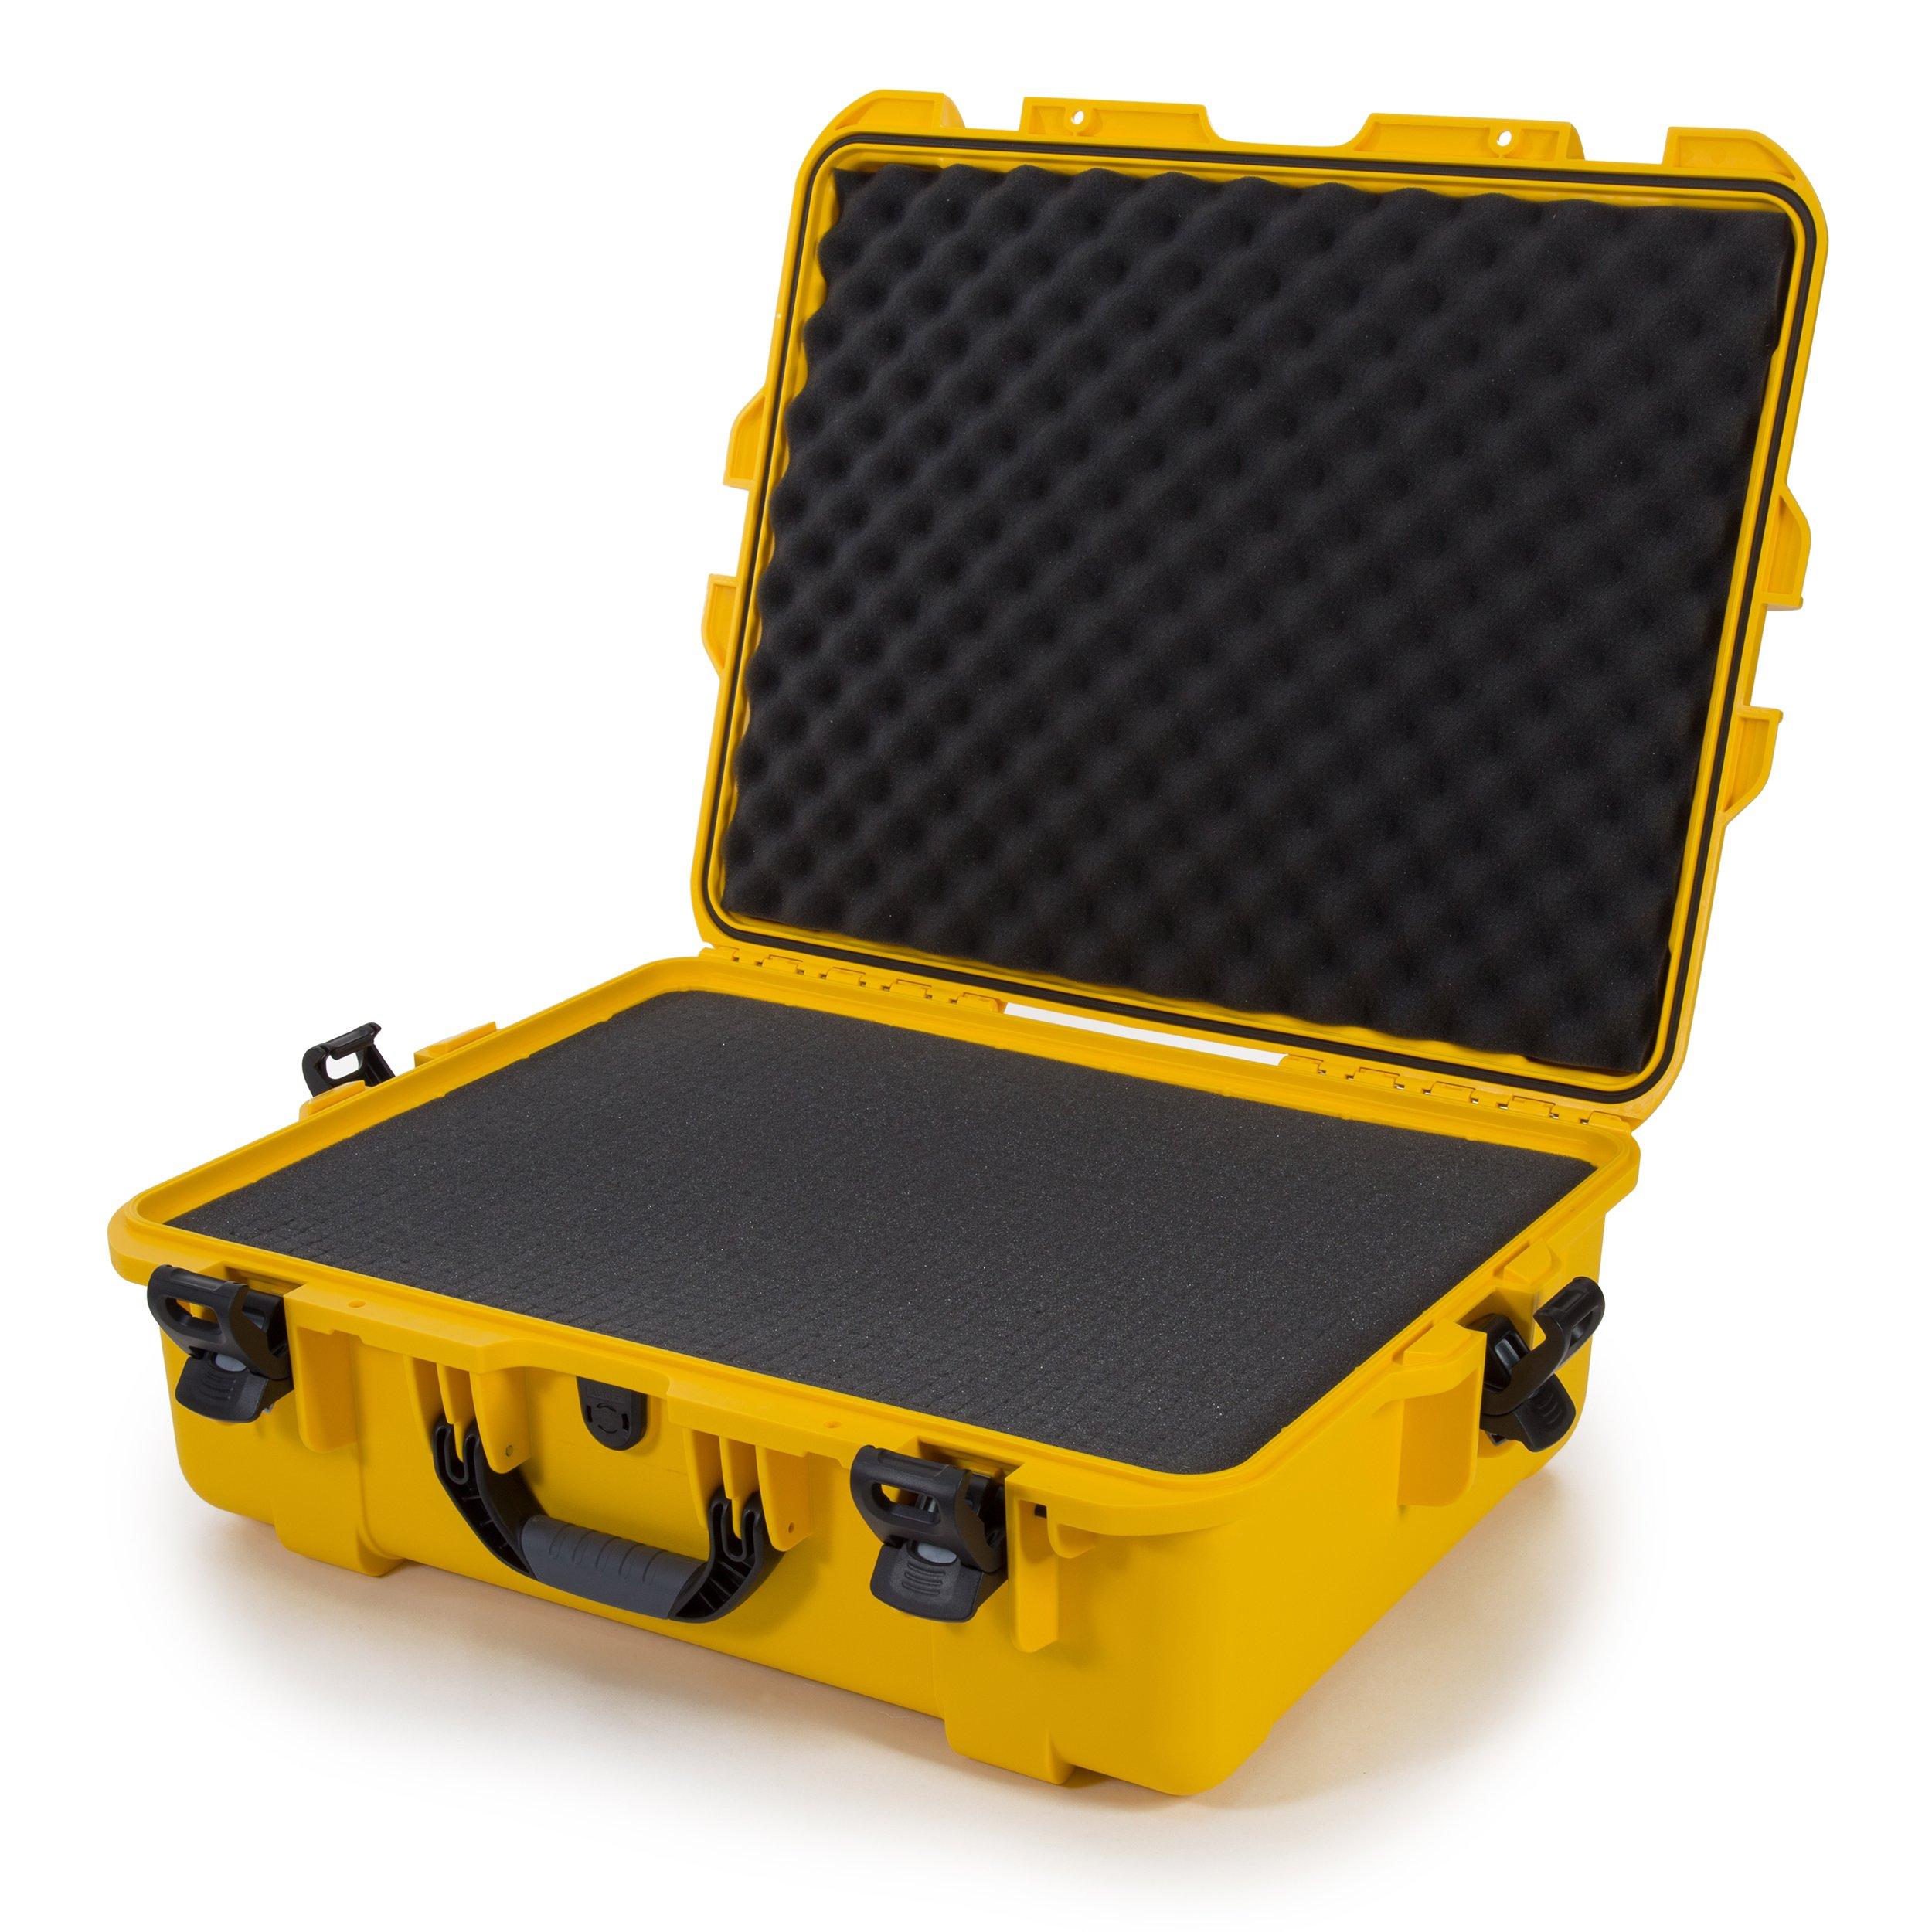 Nanuk 945 Waterproof Hard Case with Foam Insert - Yellow - Made in Canada